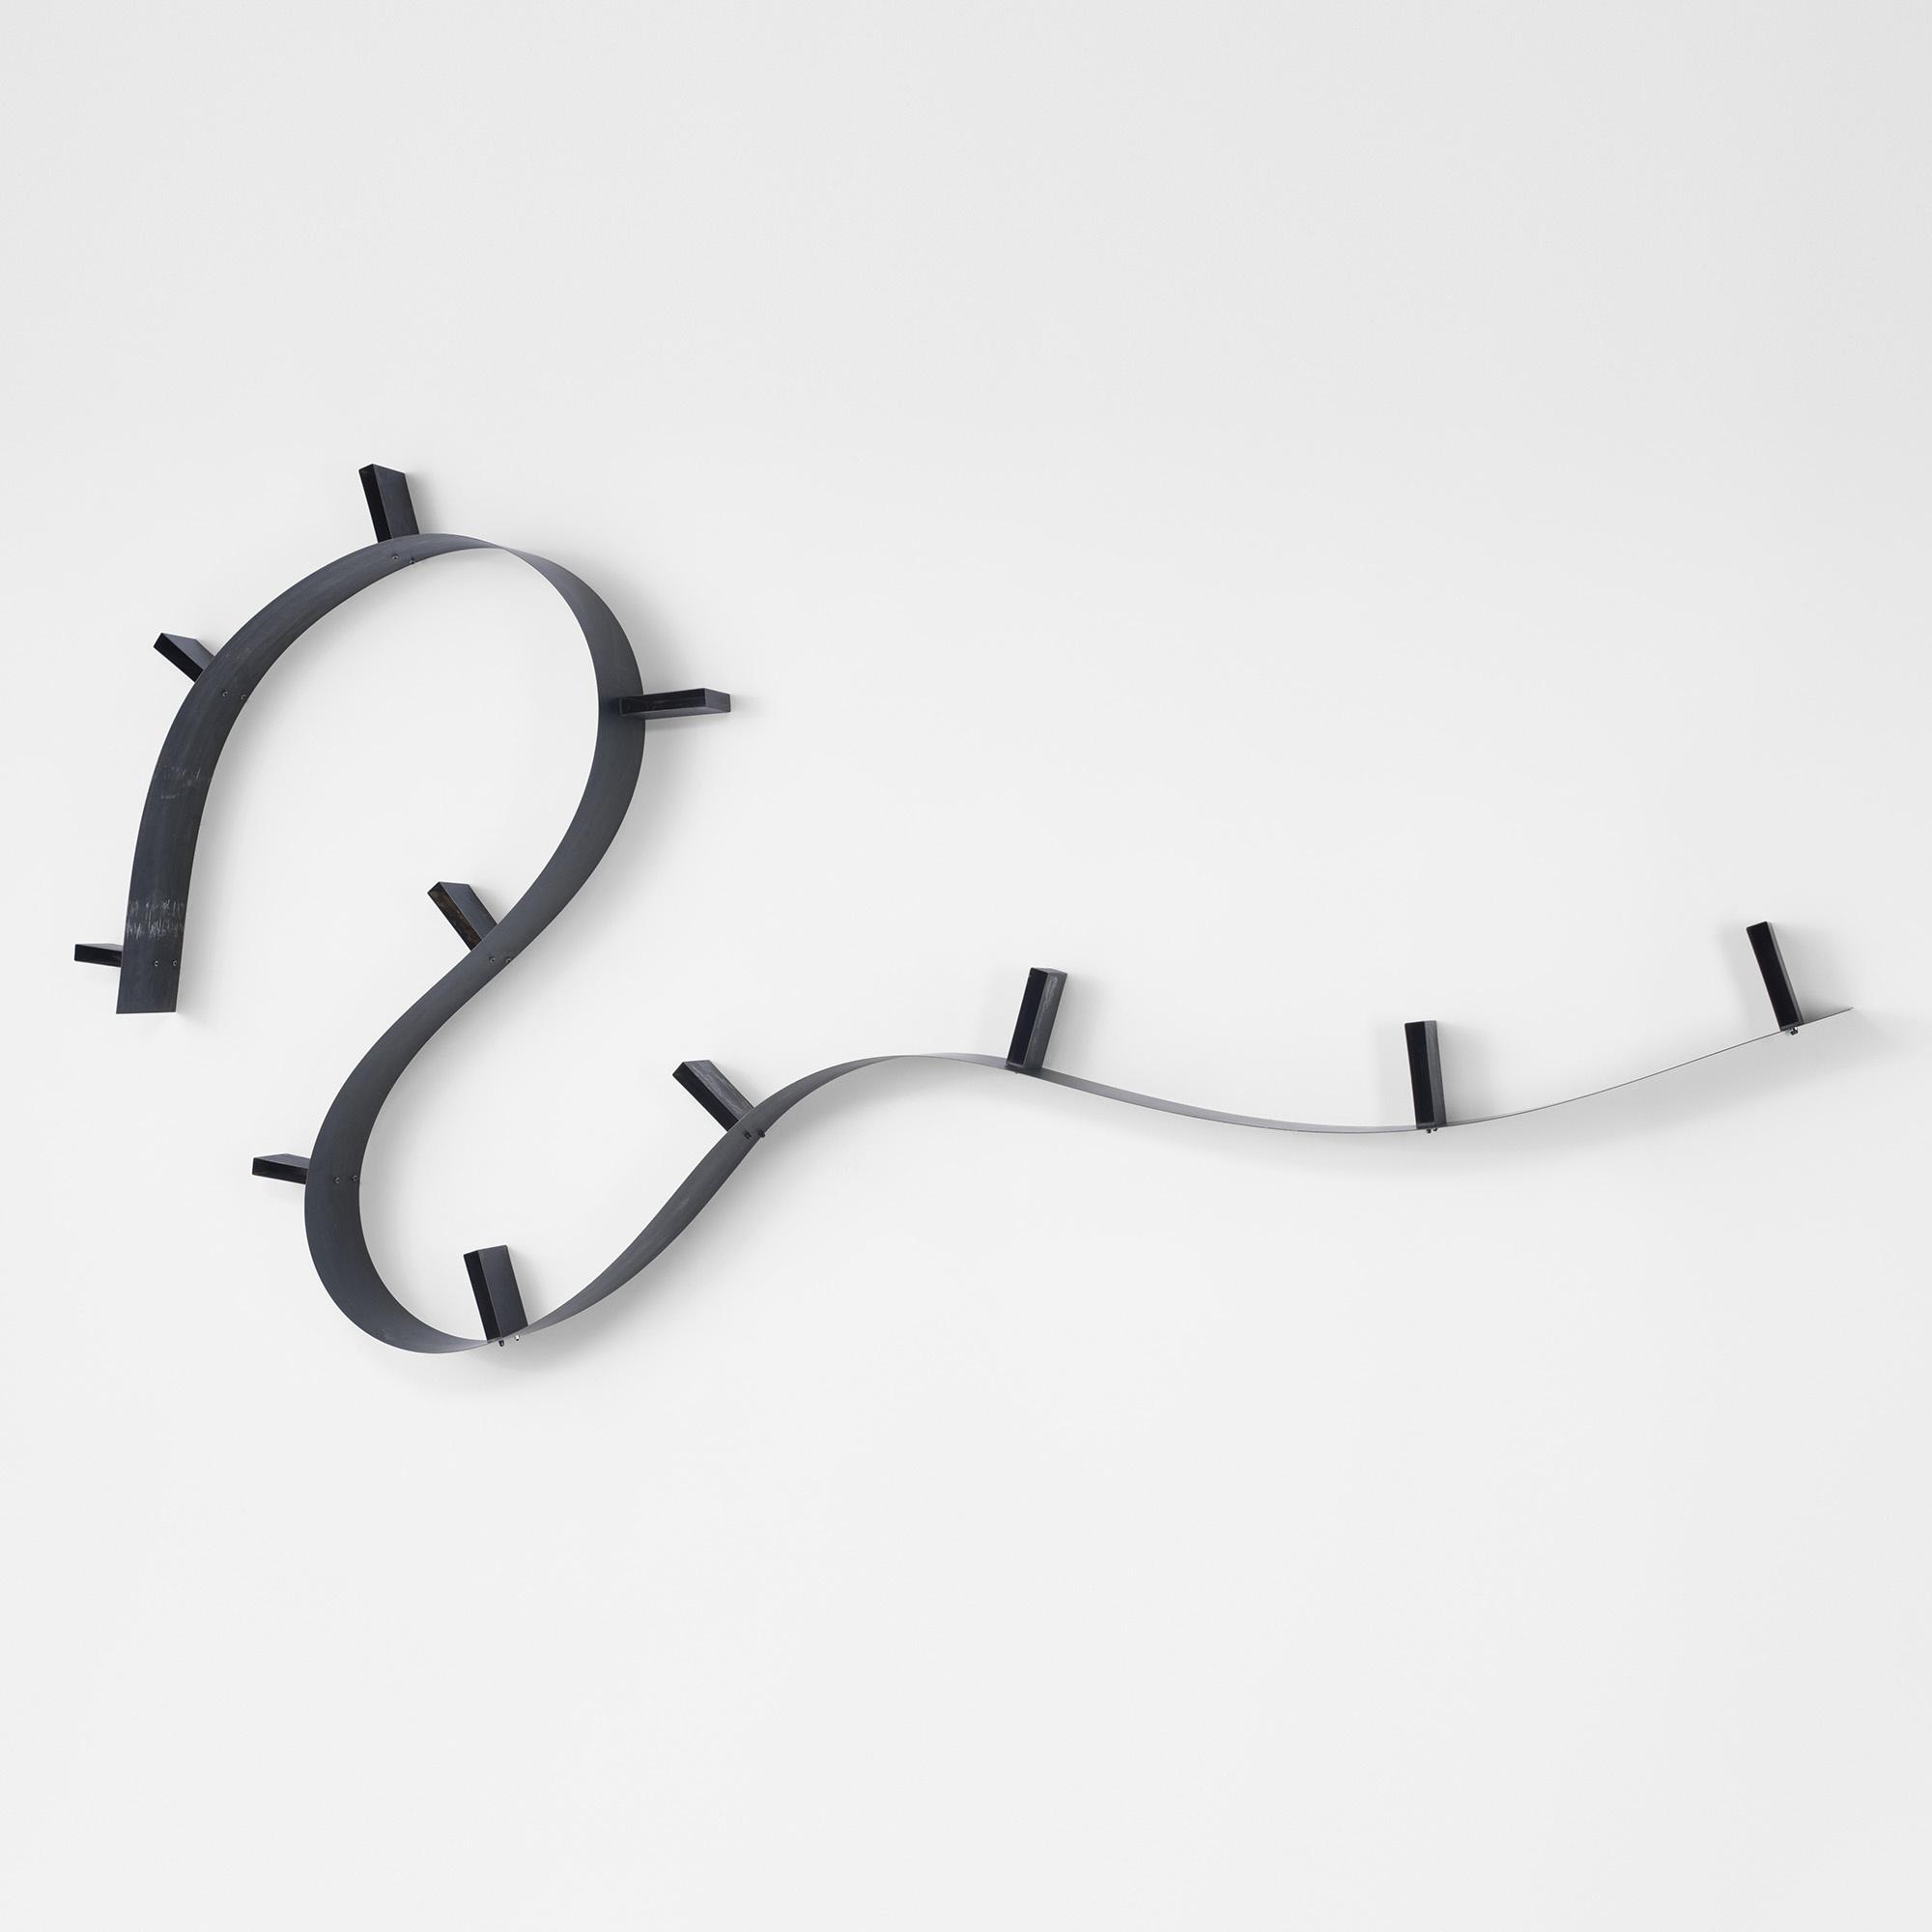 426: RON ARAD, Bookworm < Important Design, 13 December 2012 ...